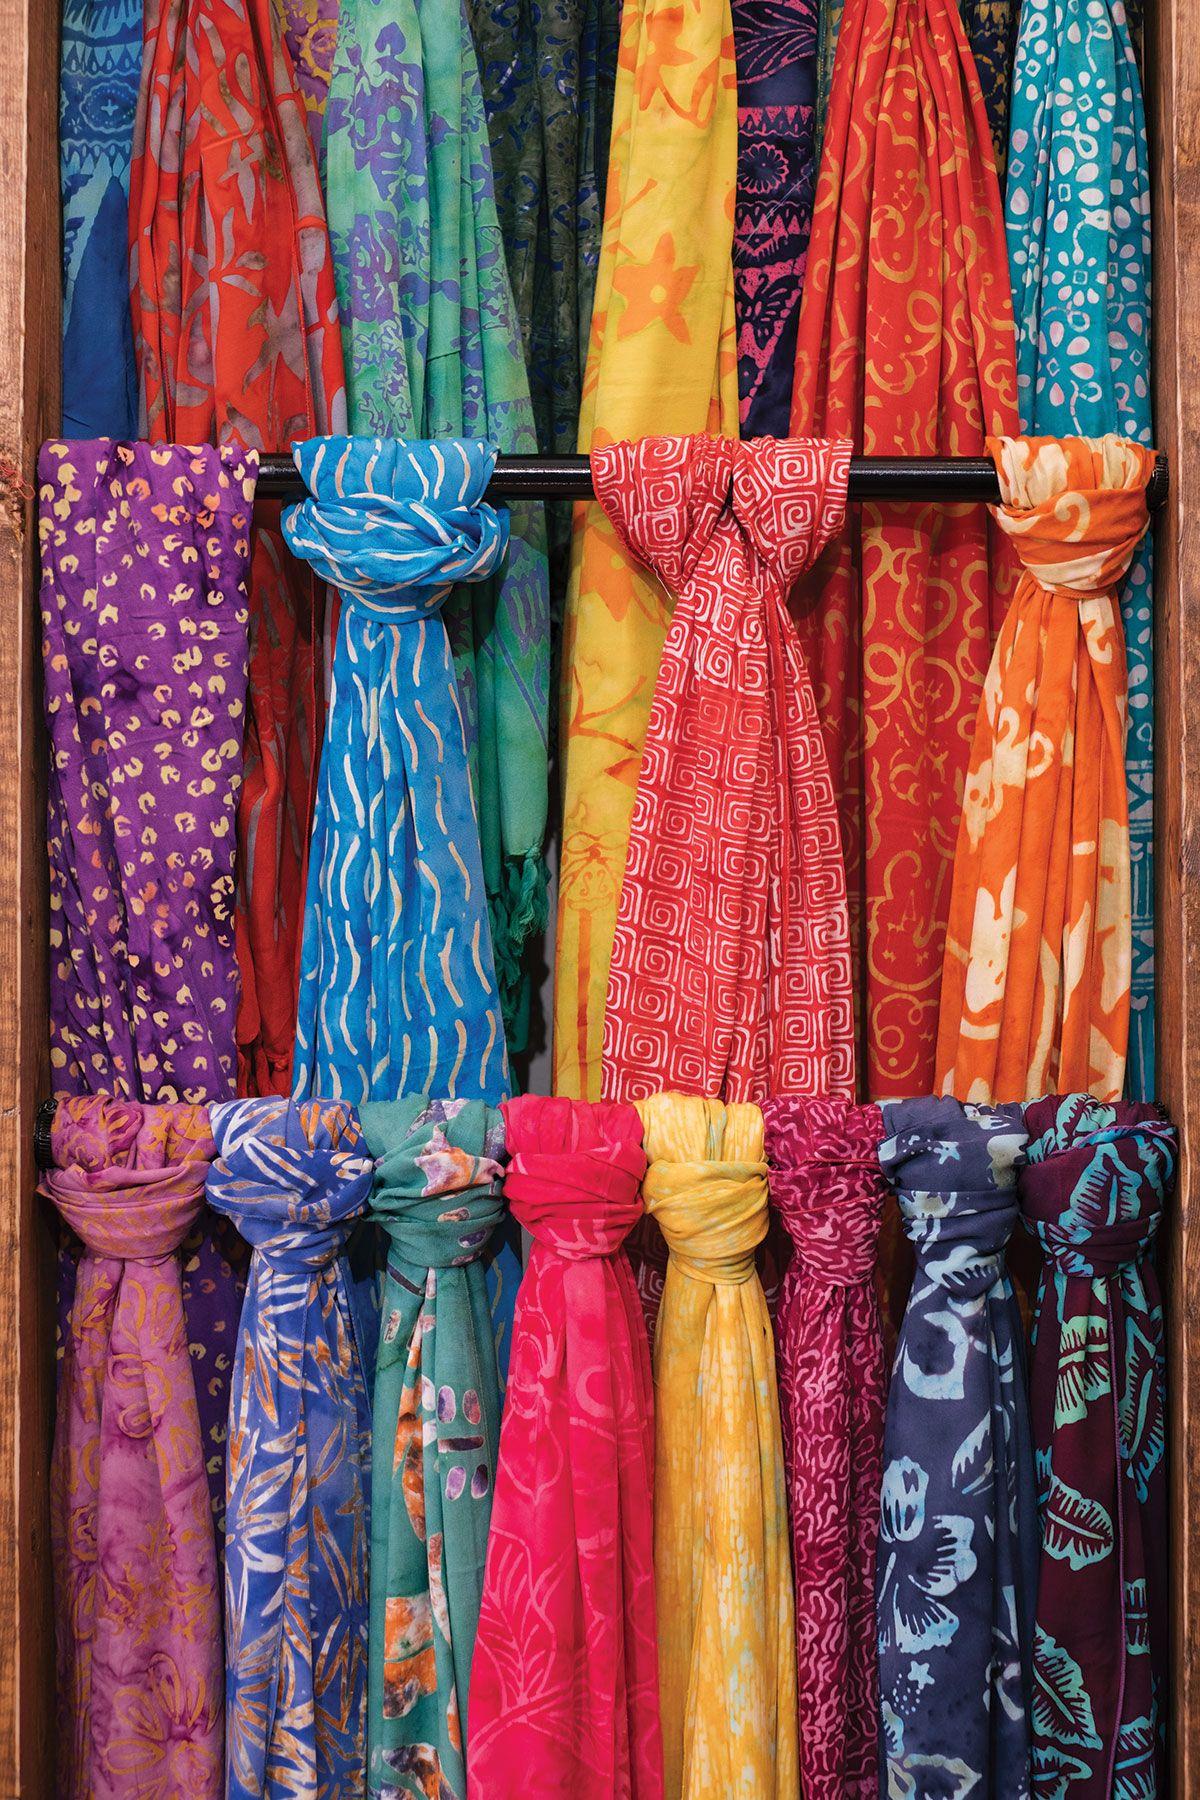 Shop Talk Latitudes Fair Trade Store Fair trade, Lily